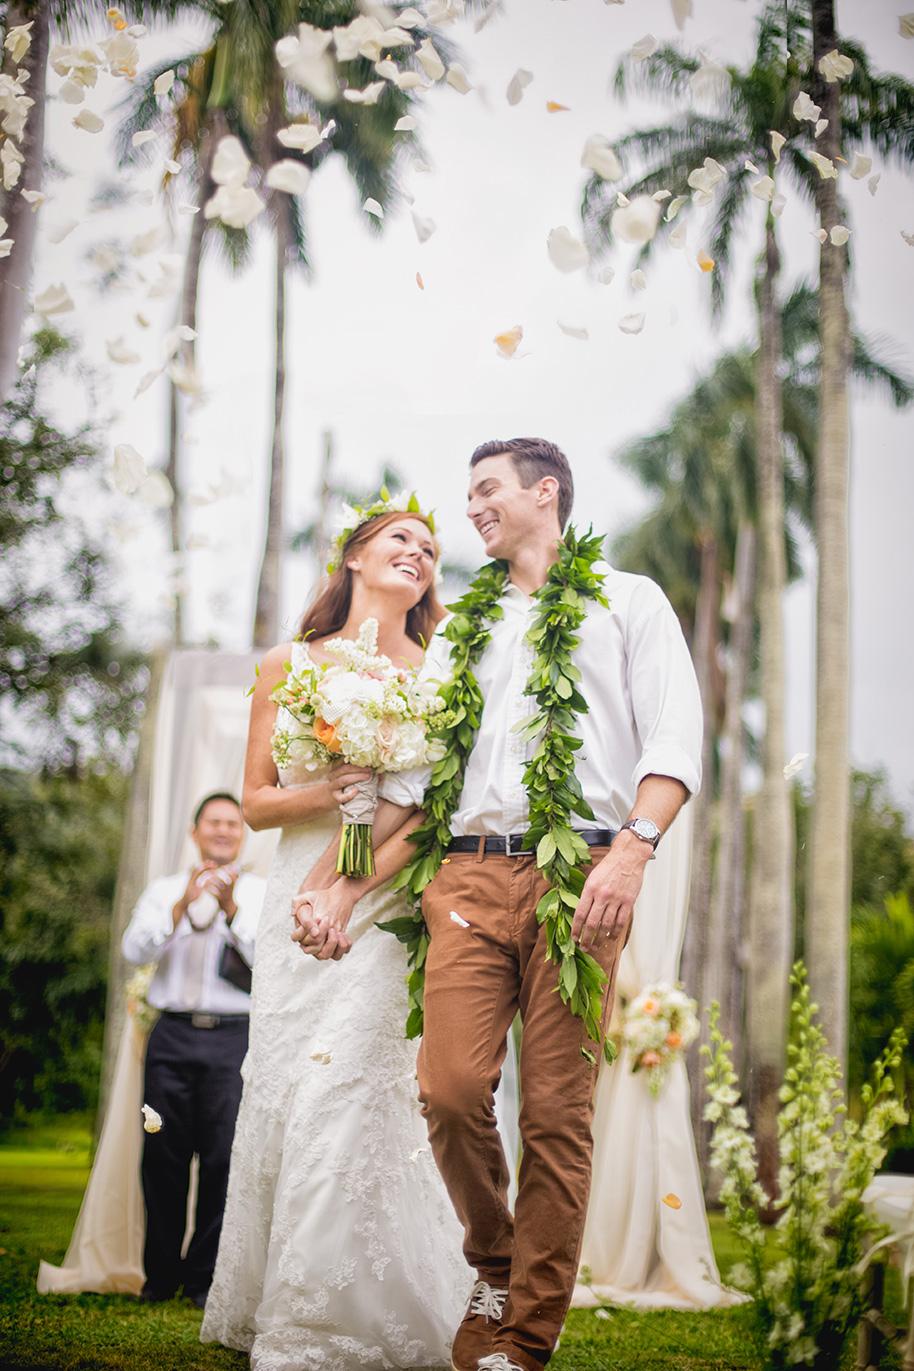 Dillingham-Ranch-Wedding-040516-17